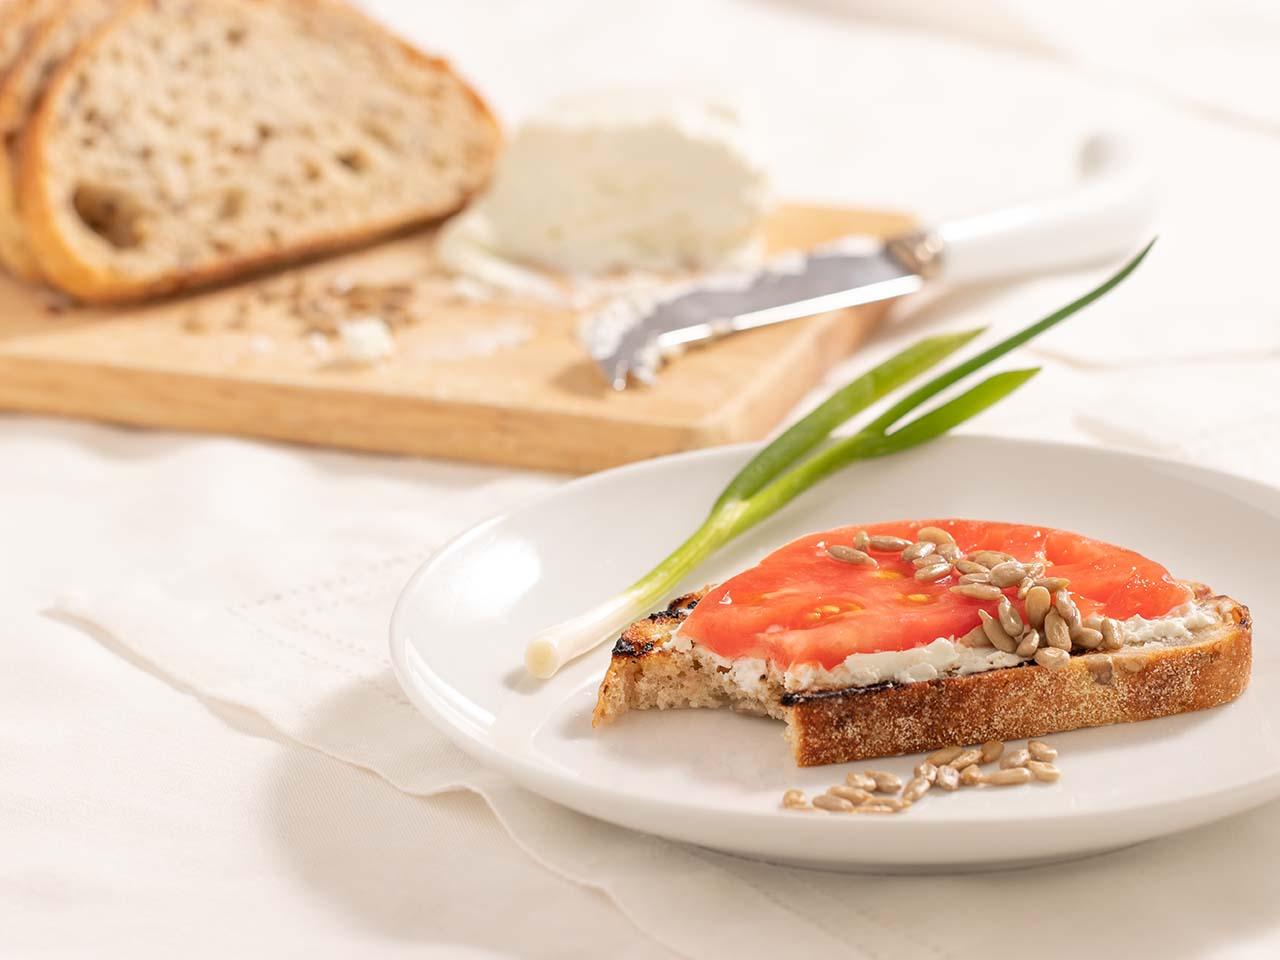 Tomato Goat Cheese SandwichII-IG-8914.jpg